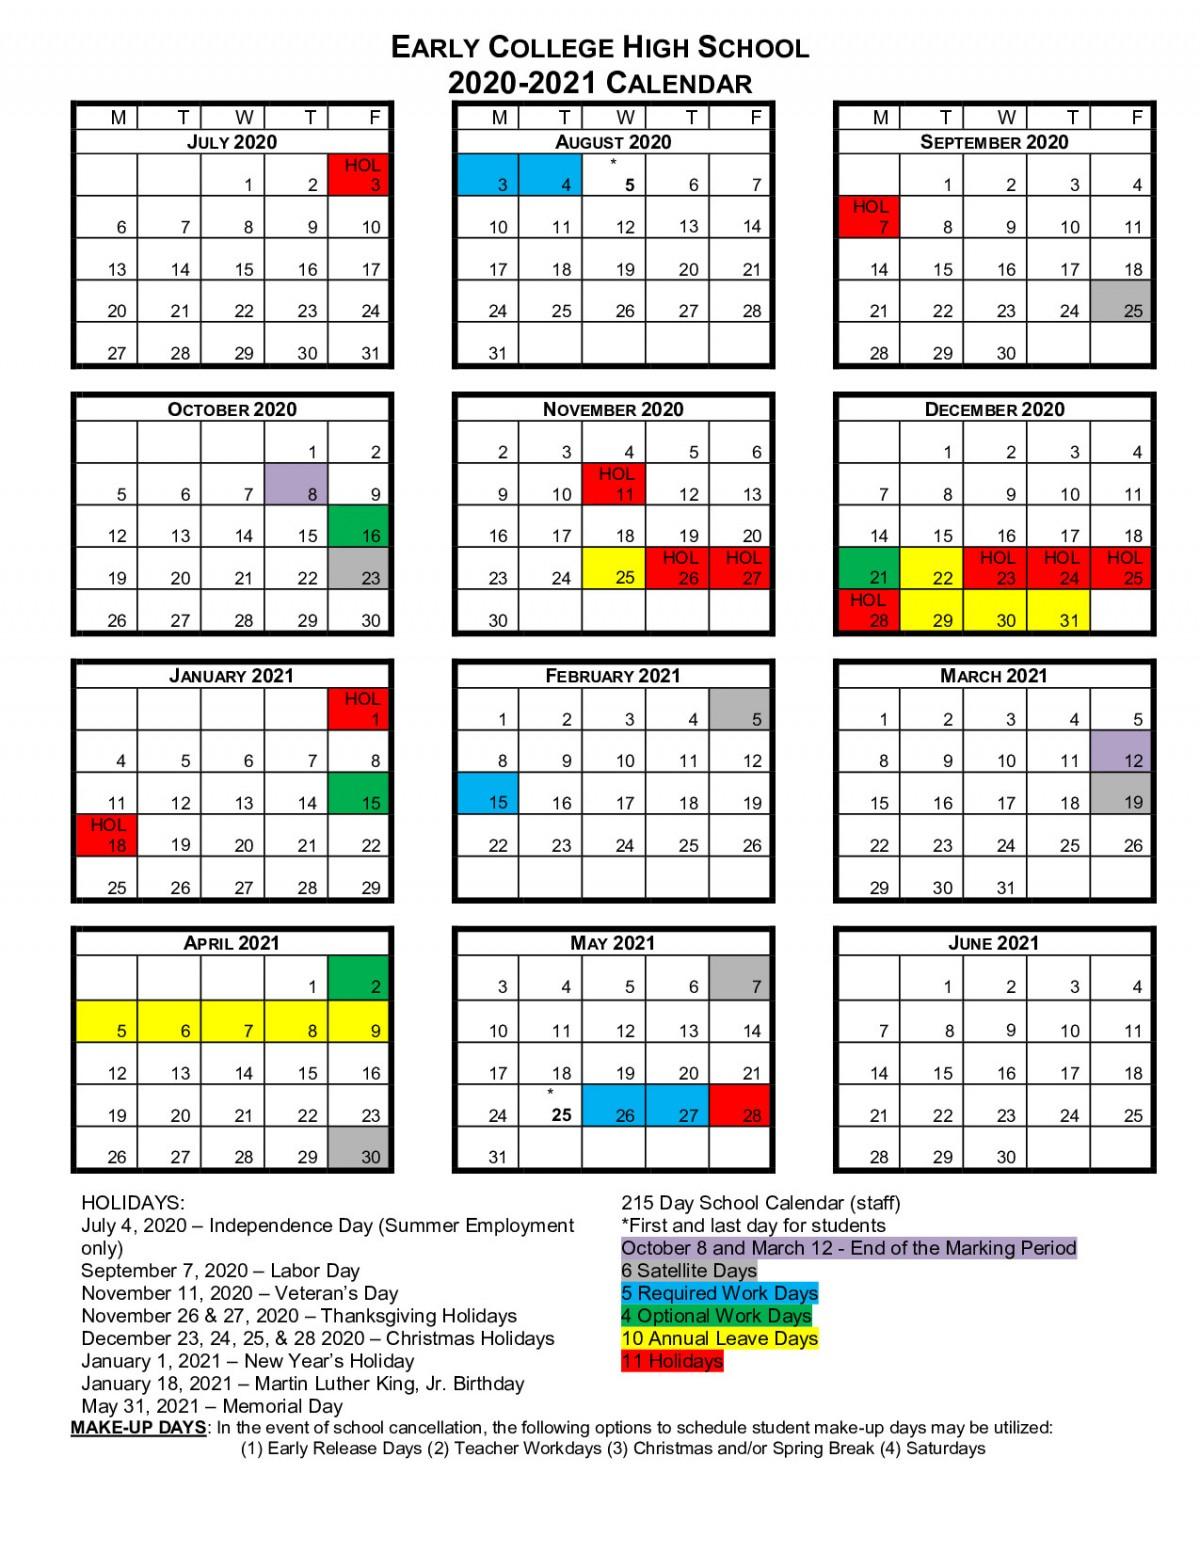 Harold Washington College Spring Break | Printable Throughout When Is College Spring Break 2021